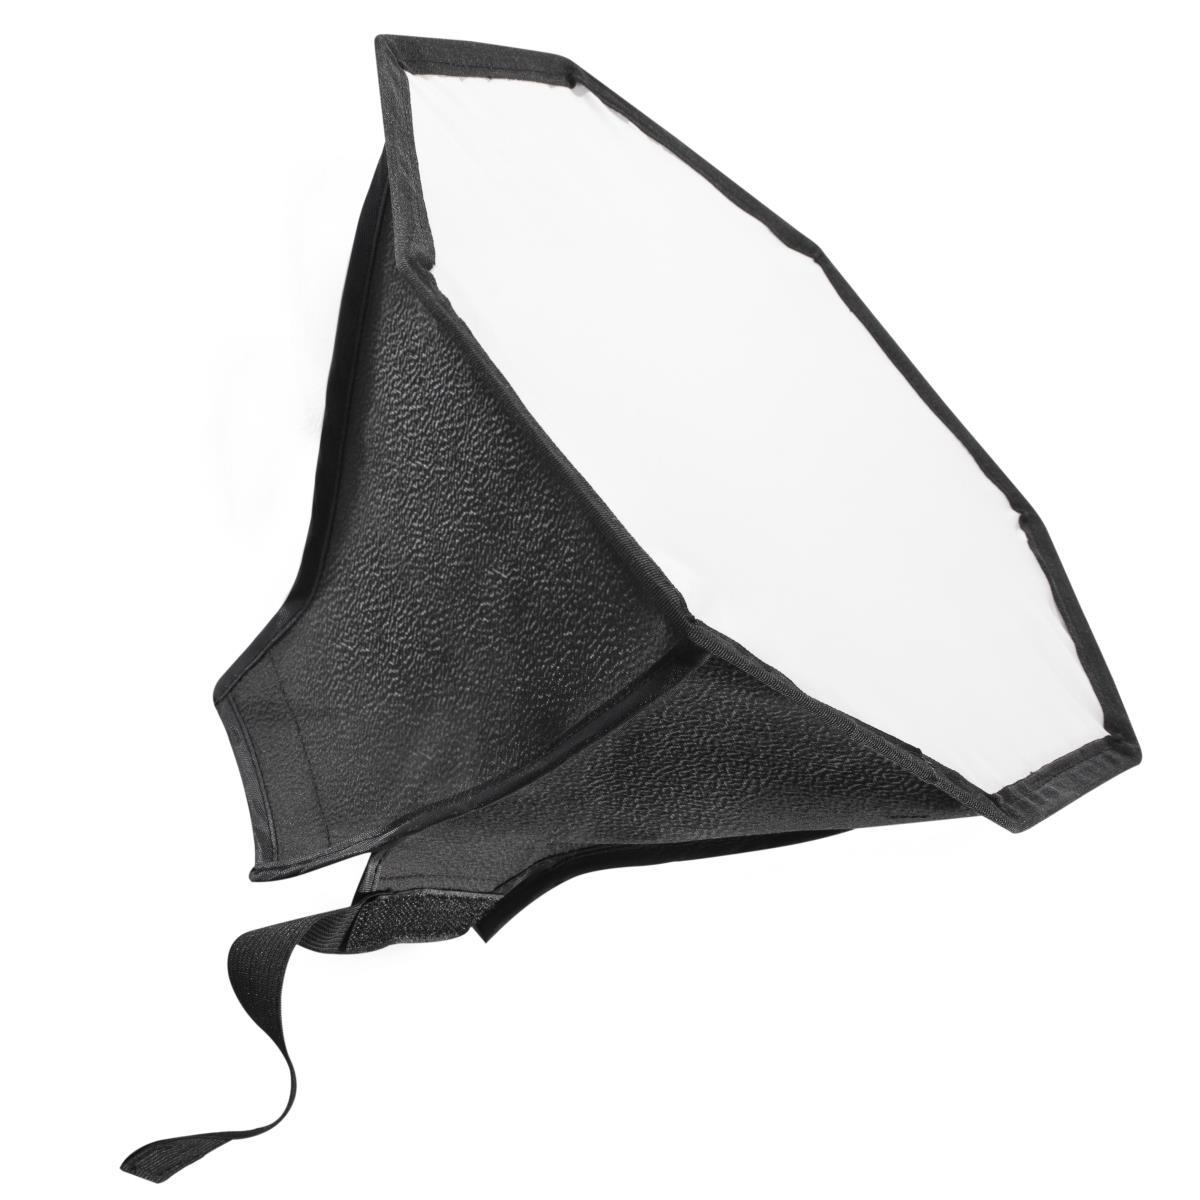 Walimex pro Octagon Softbox Ø28cm für Systemblitz